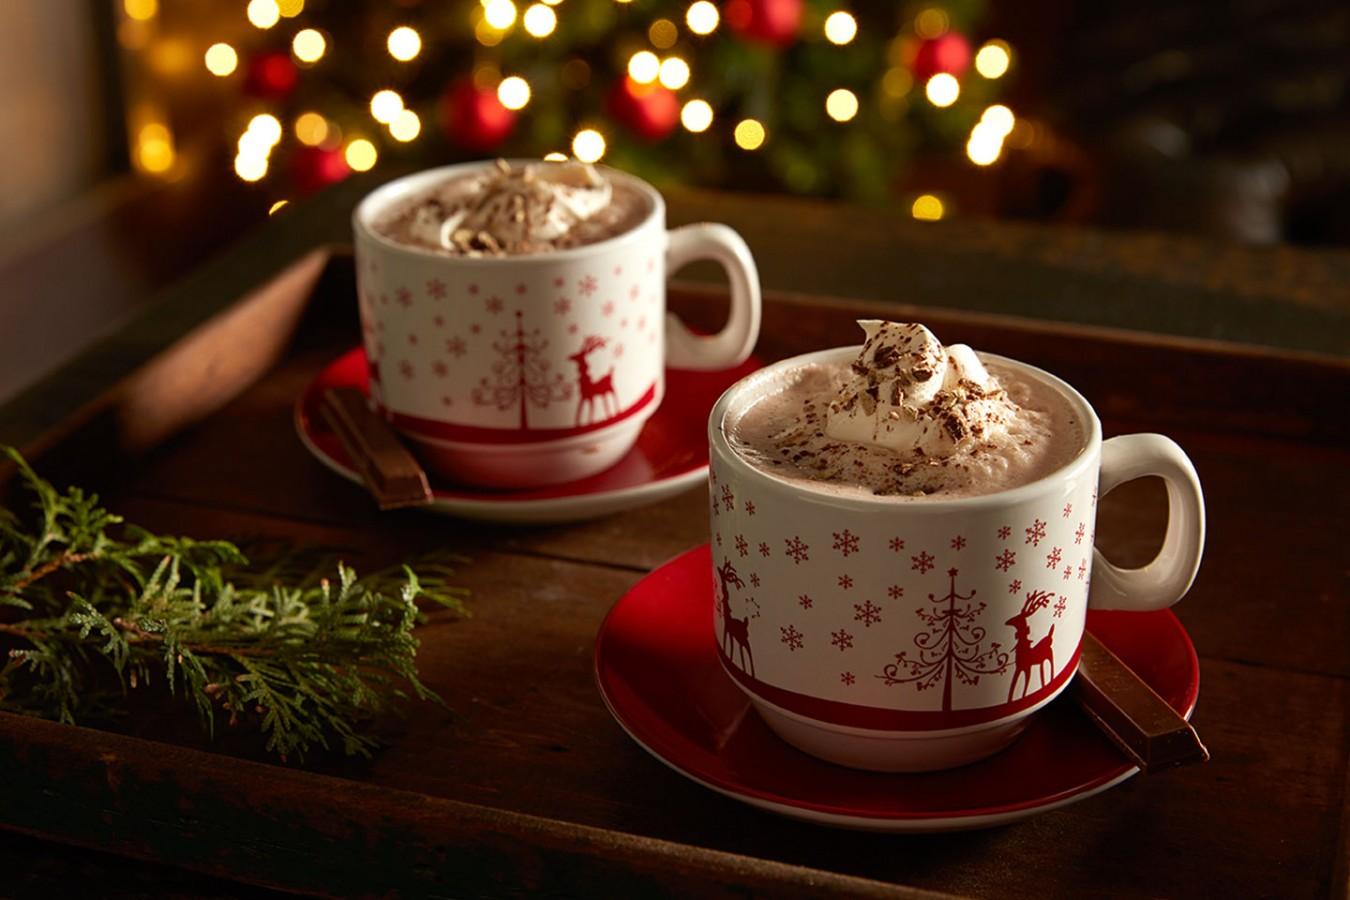 KIT KAT Spiked Hot Chocolate